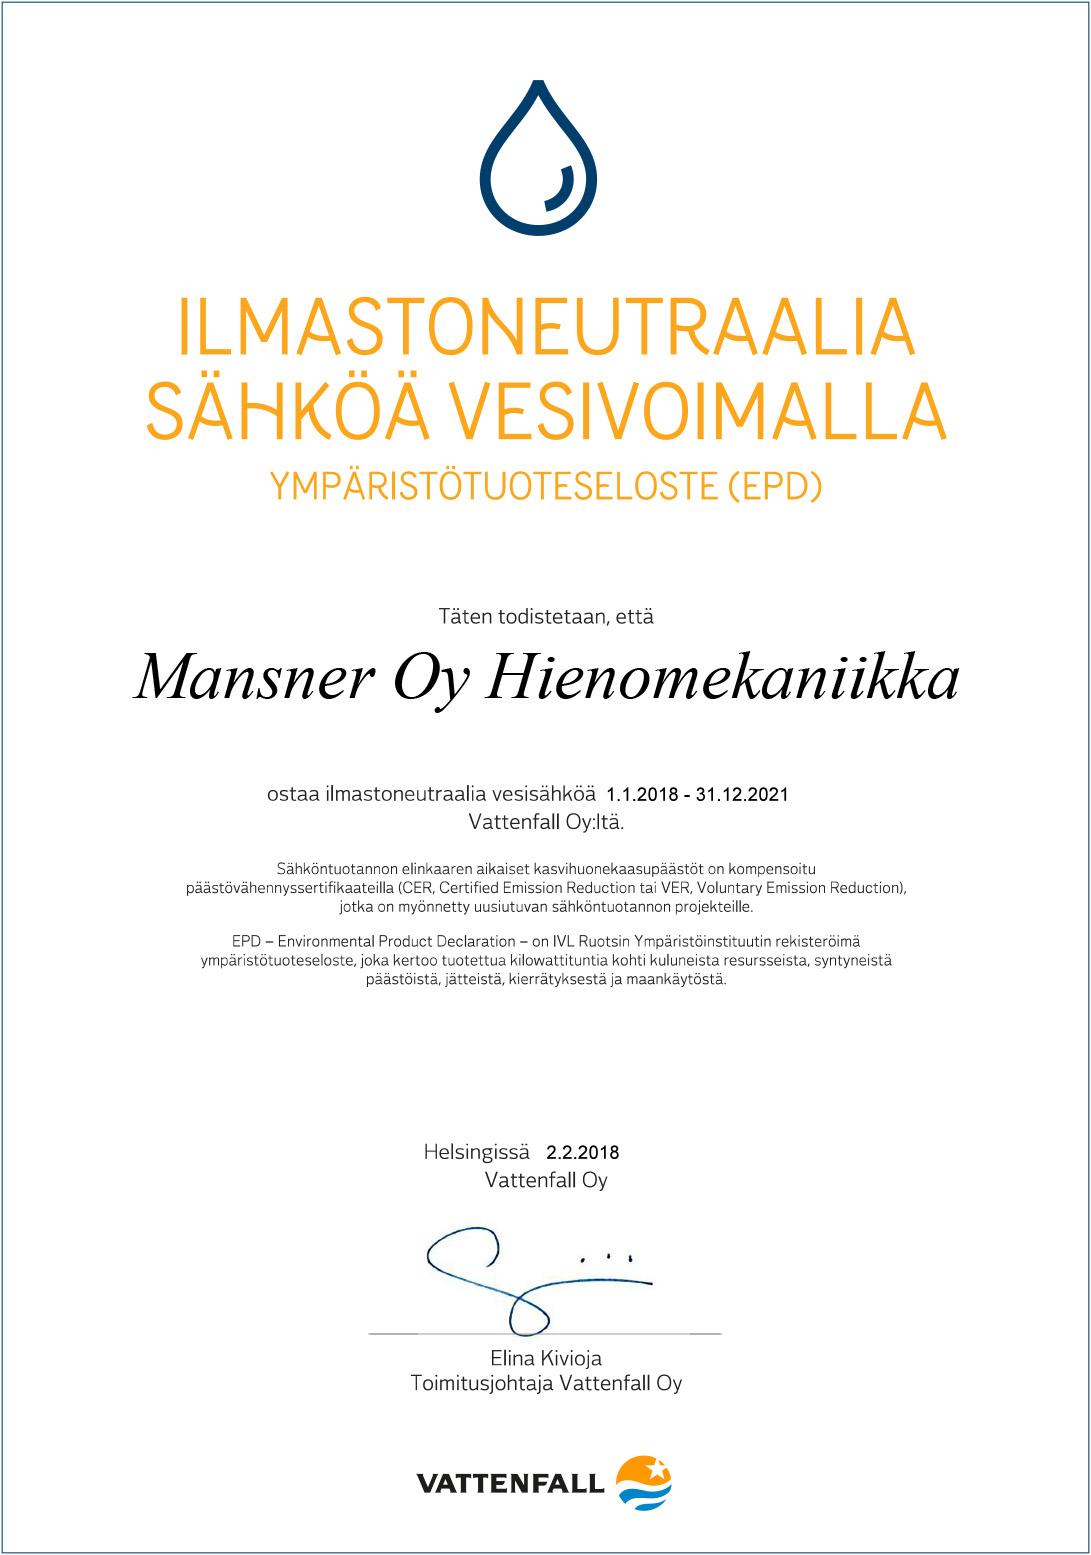 Ilmastoneutraali diplomi Mansner Oy